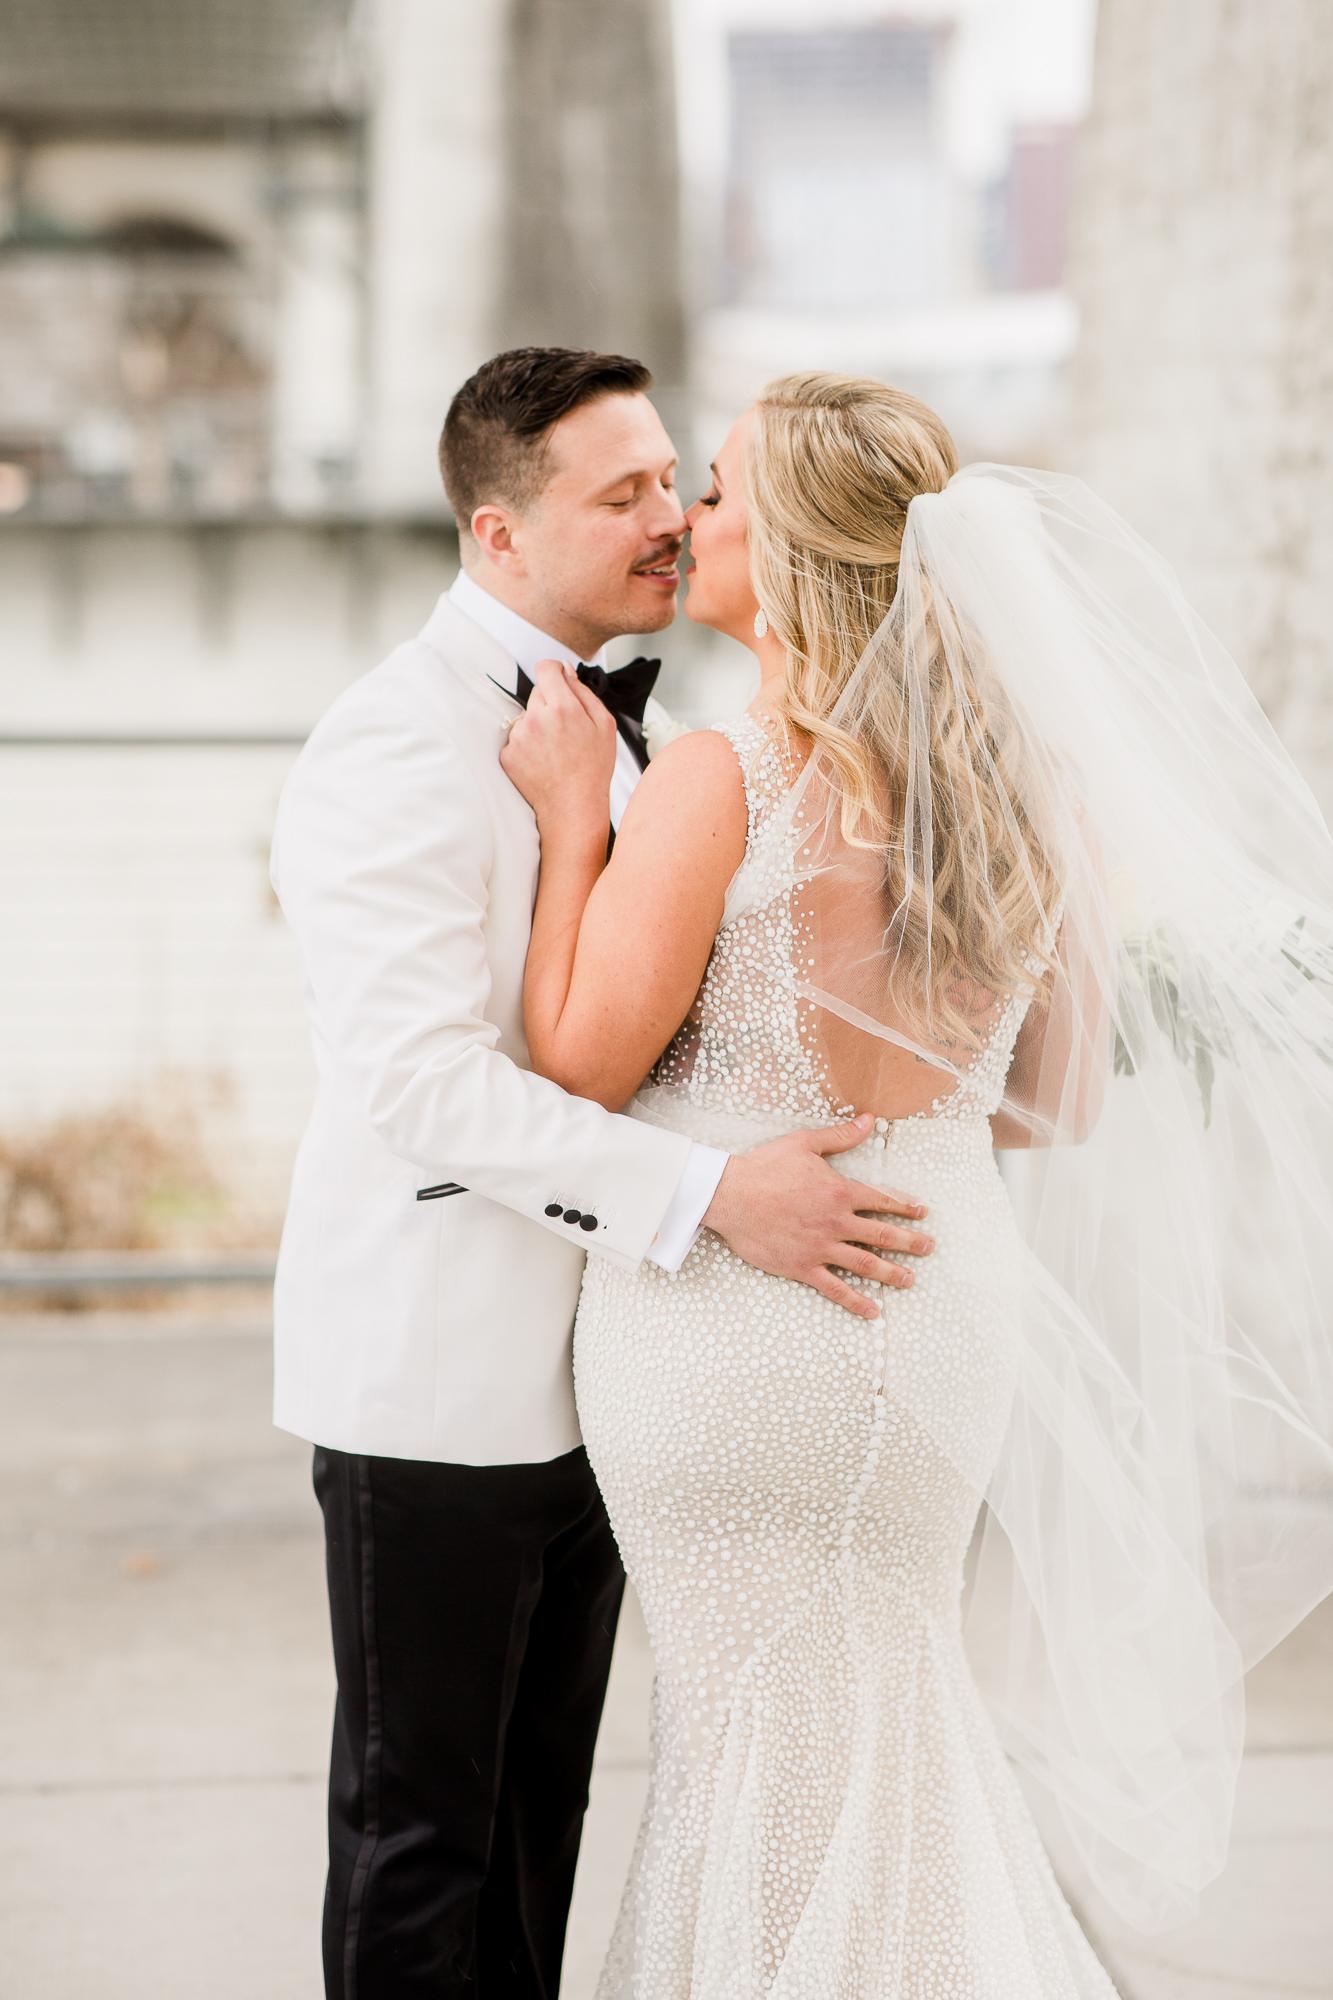 Amanda May Photos Nashville Wedding Photography   Nashville Bride Guide